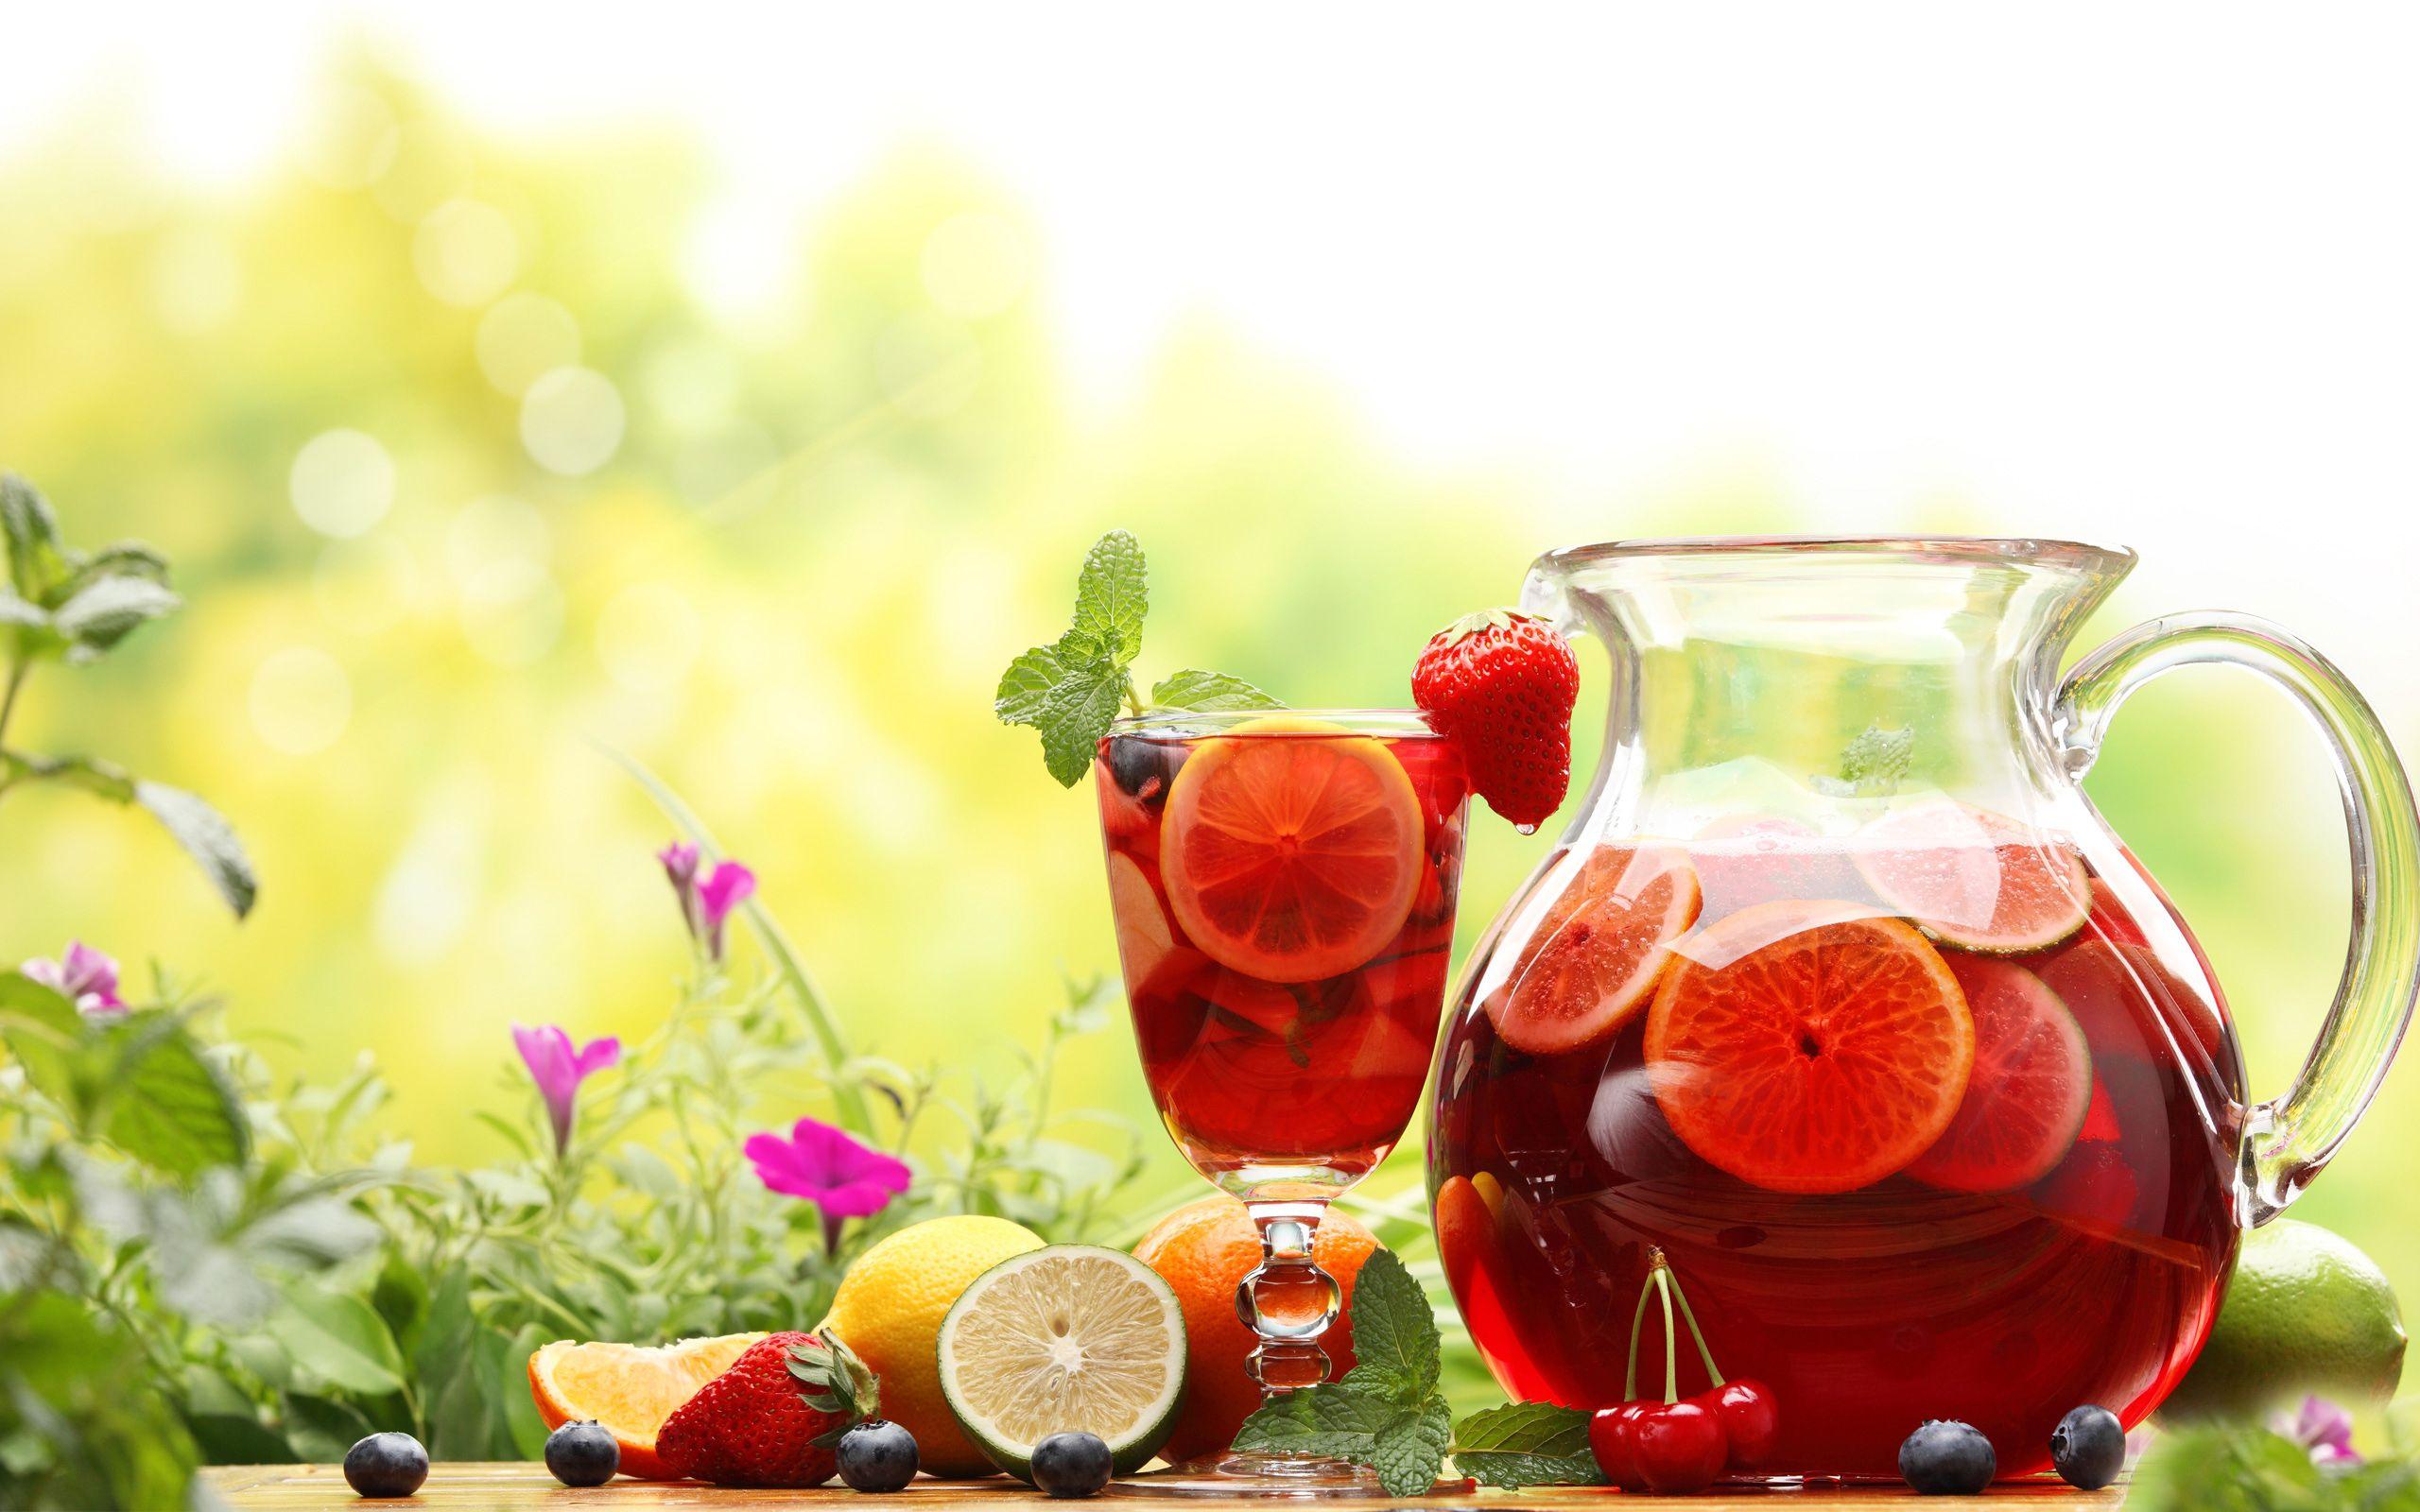 Strawberry Lemonade HD Wallpaper Cool, Cold Drinks